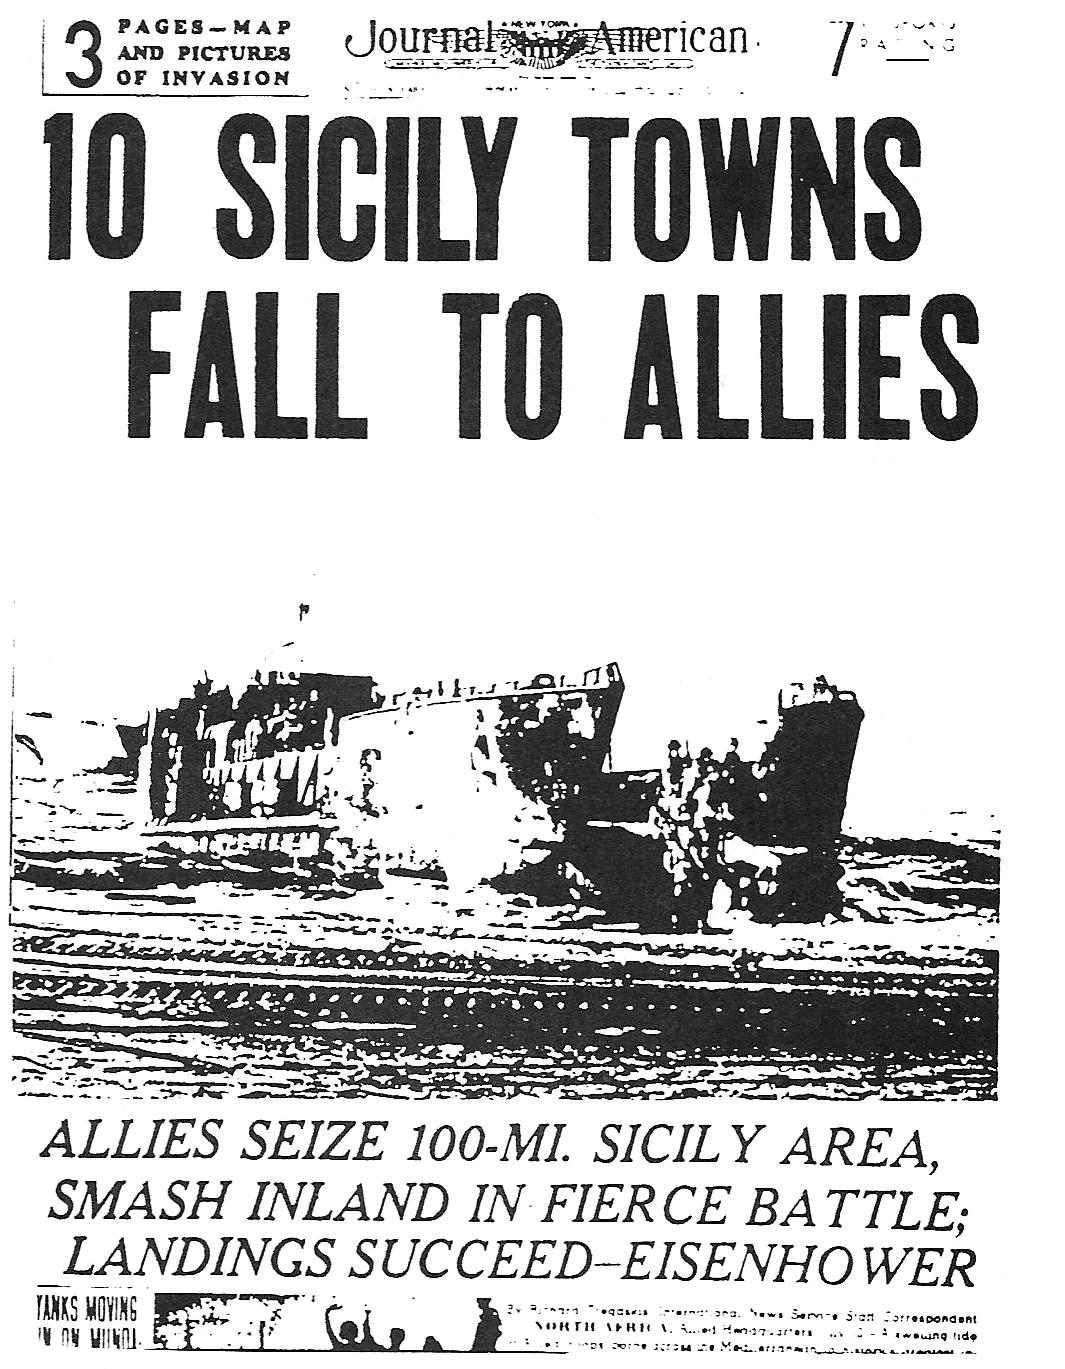 Advertising-print 1950-59 1954 Arnaldo Cortesi Photo & Bio New York Times Vintage Print Ad